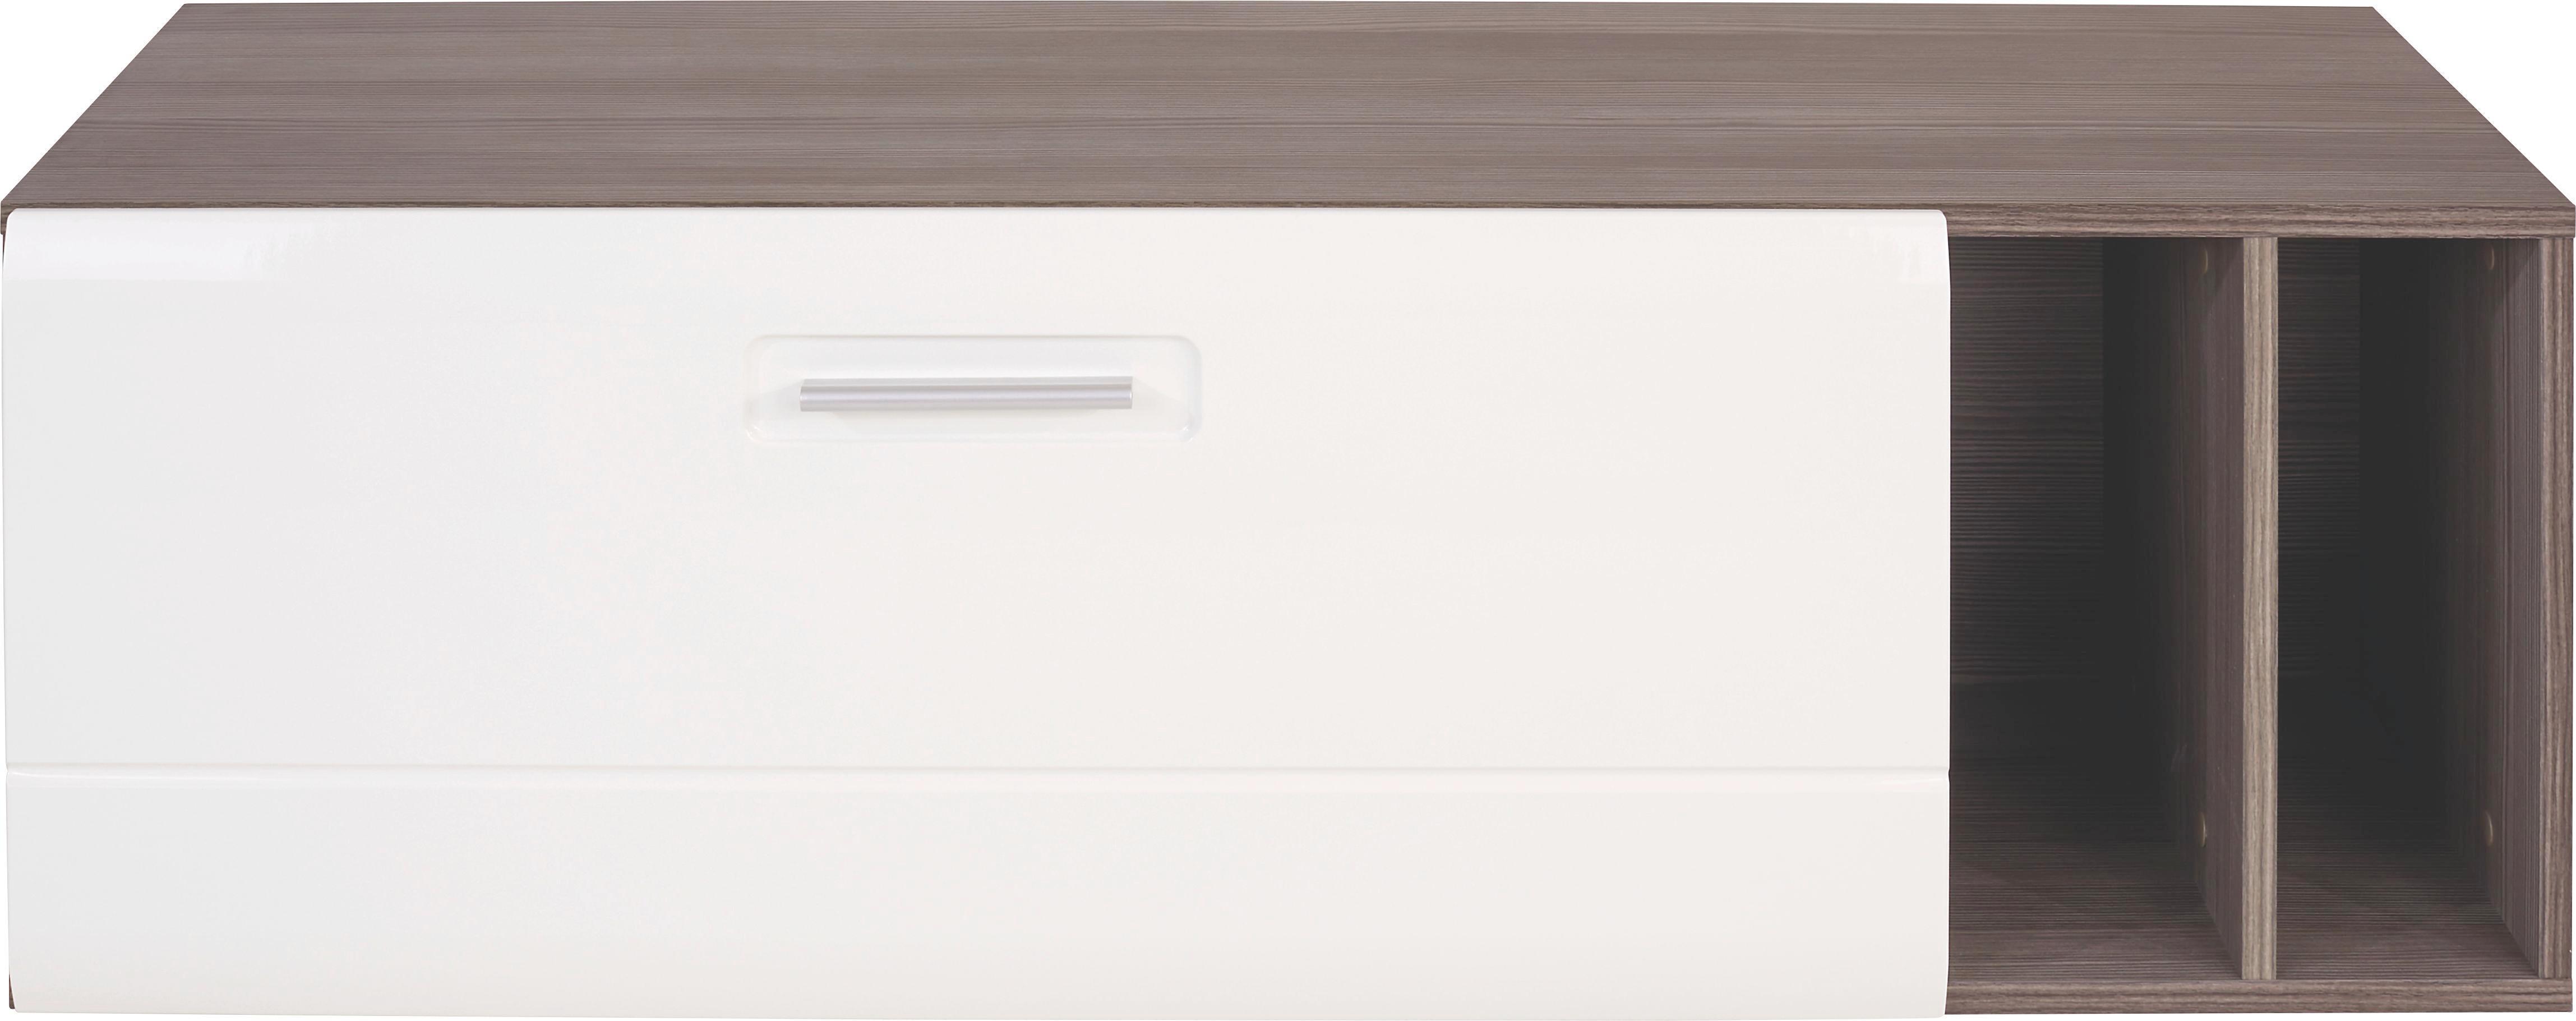 Függesztett Elem Avensis - bronz szín/fehér, modern, fa (120/39/37cm) - LUCA BESSONI